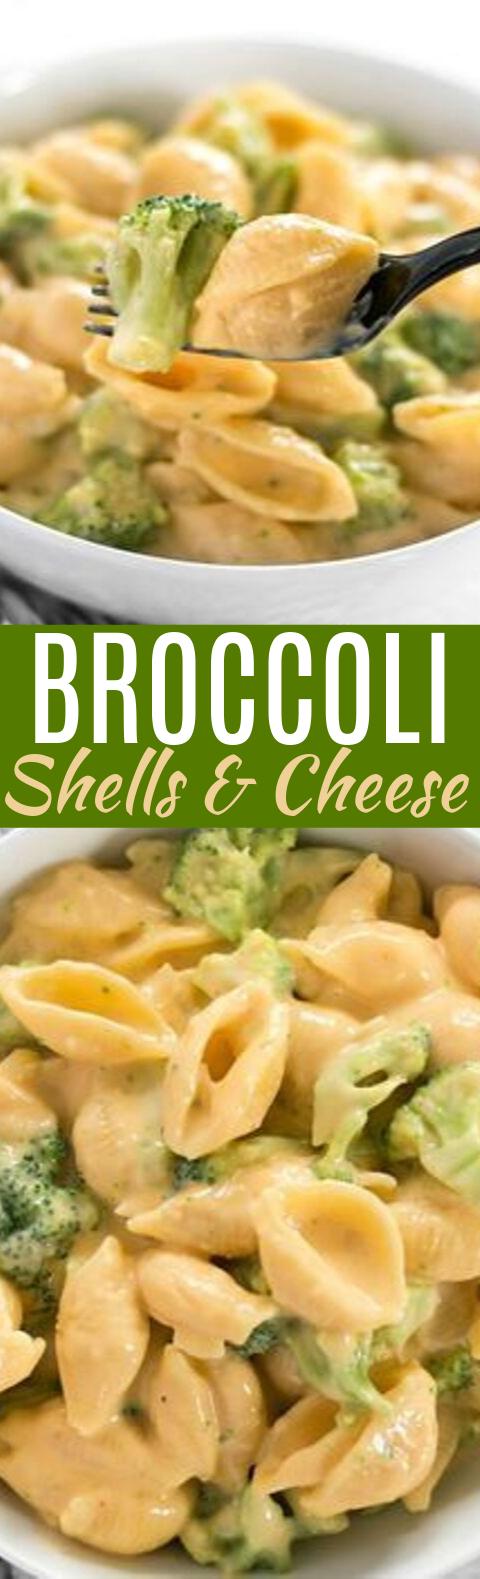 Broccoli Shells n' Cheese #dinner #pasta